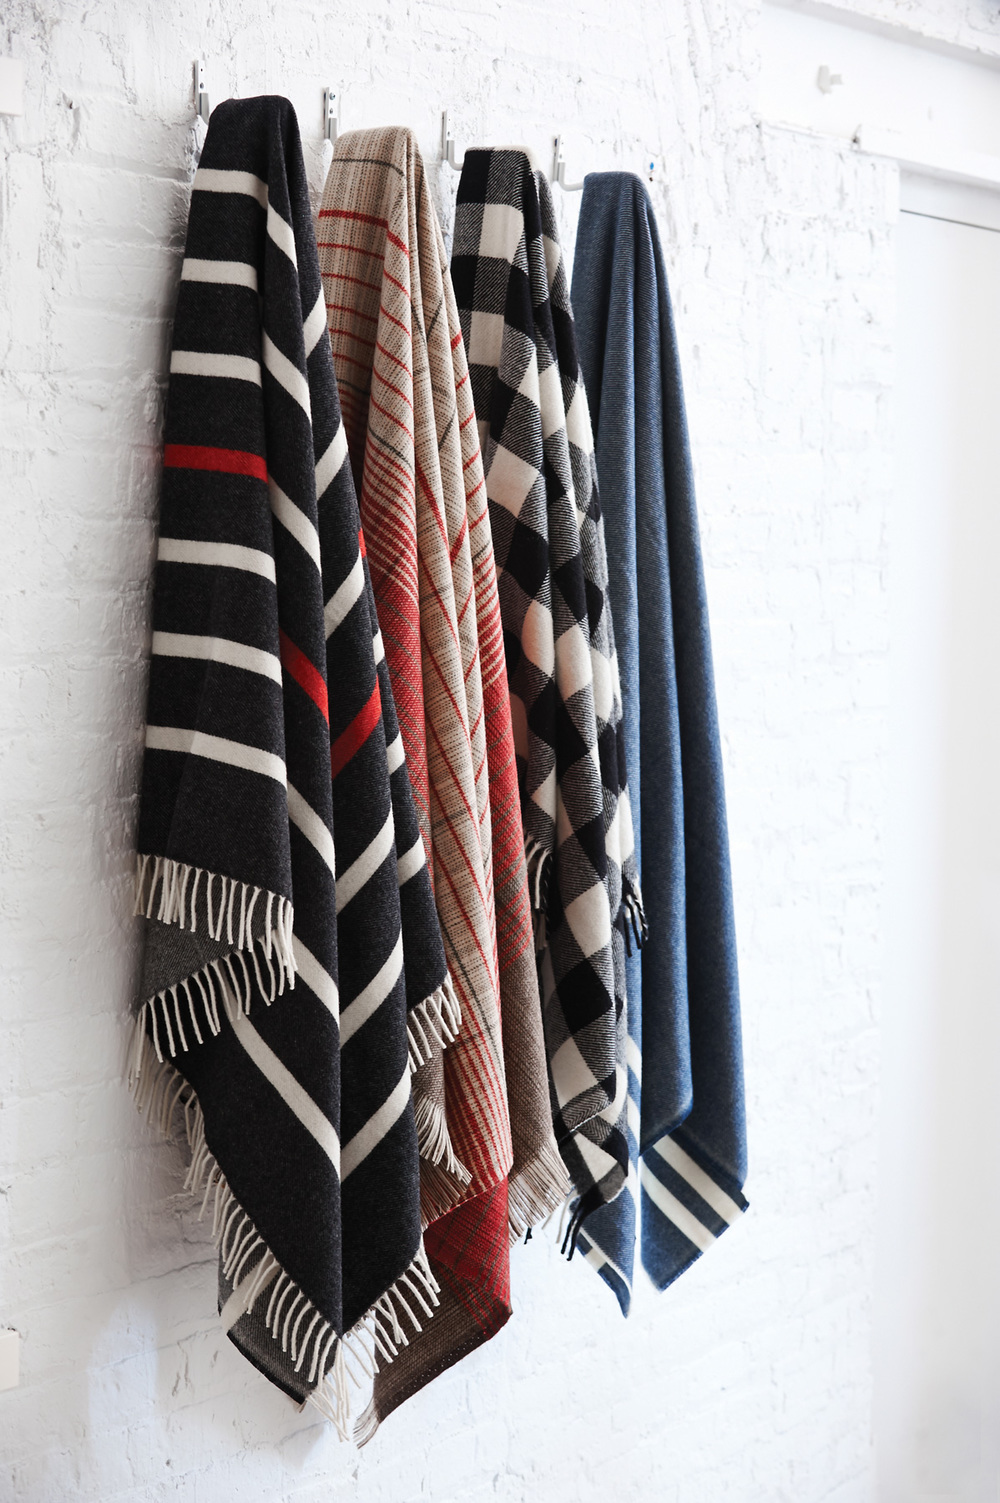 Blankets_Hanging_jpg.jpg